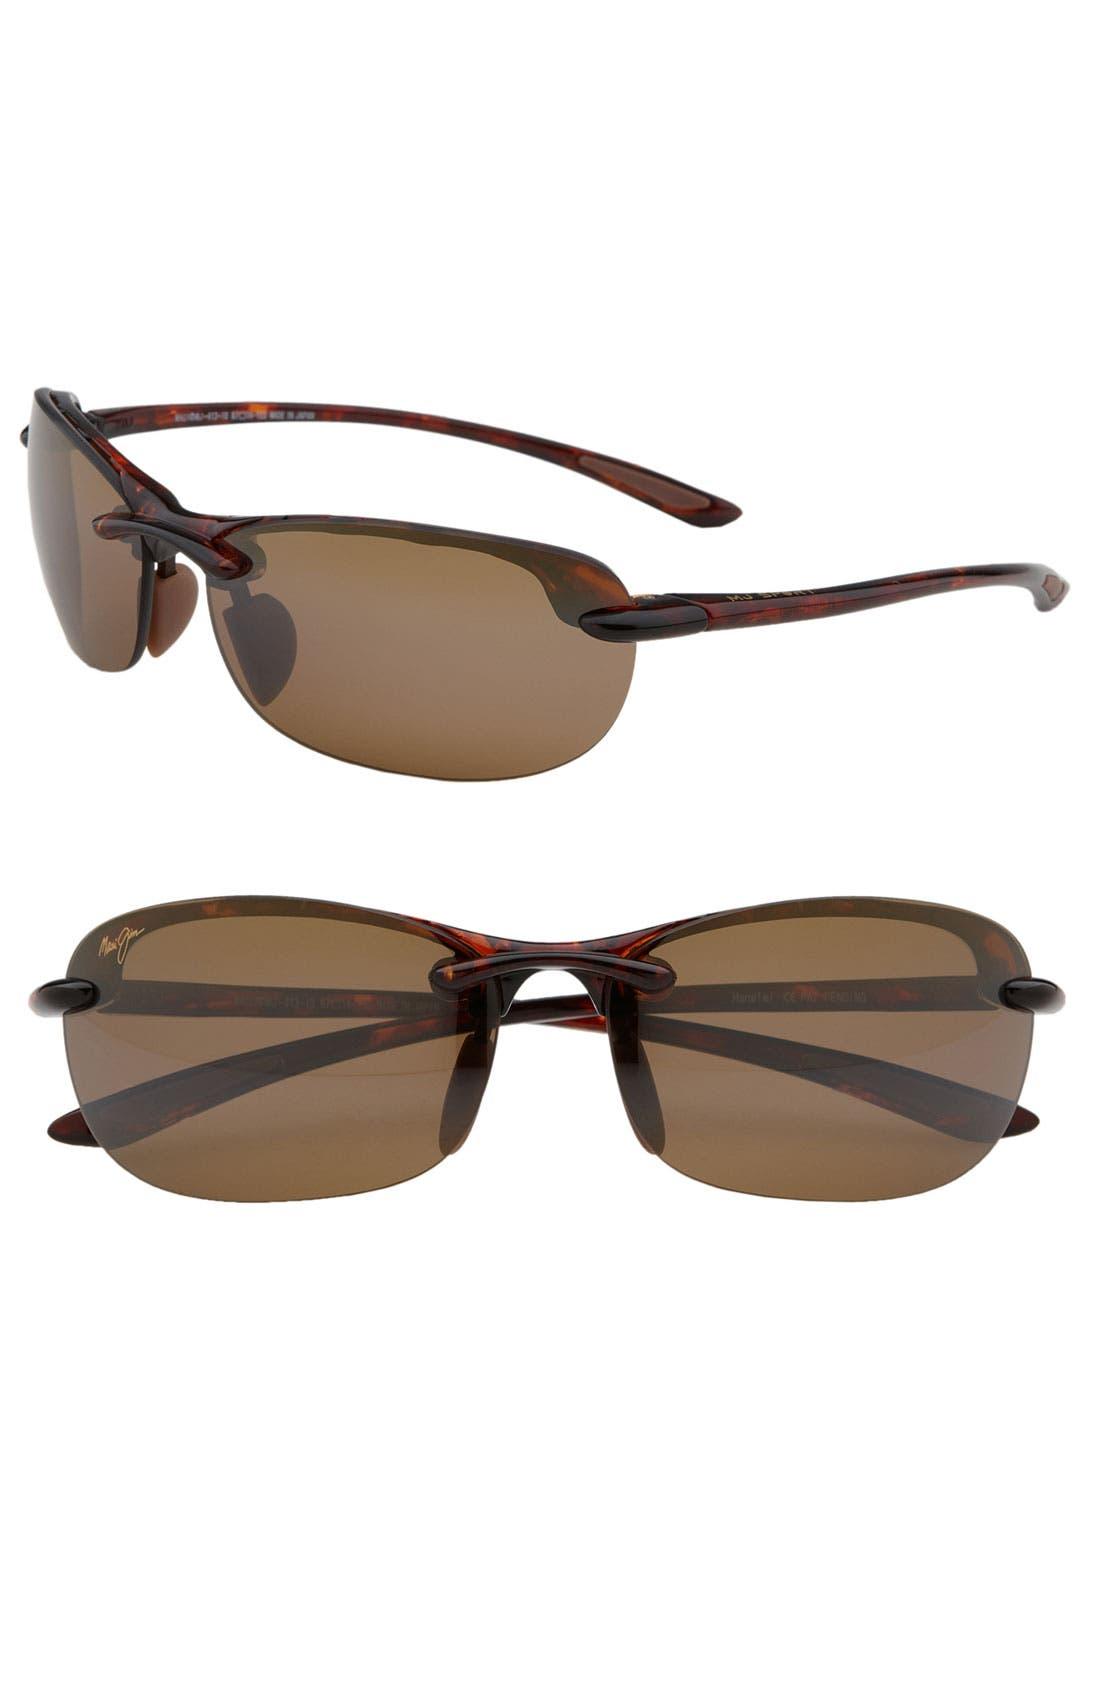 Main Image - Maui Jim Hanalei 64mm PolarizedPlus2® Rimless Sunglasses